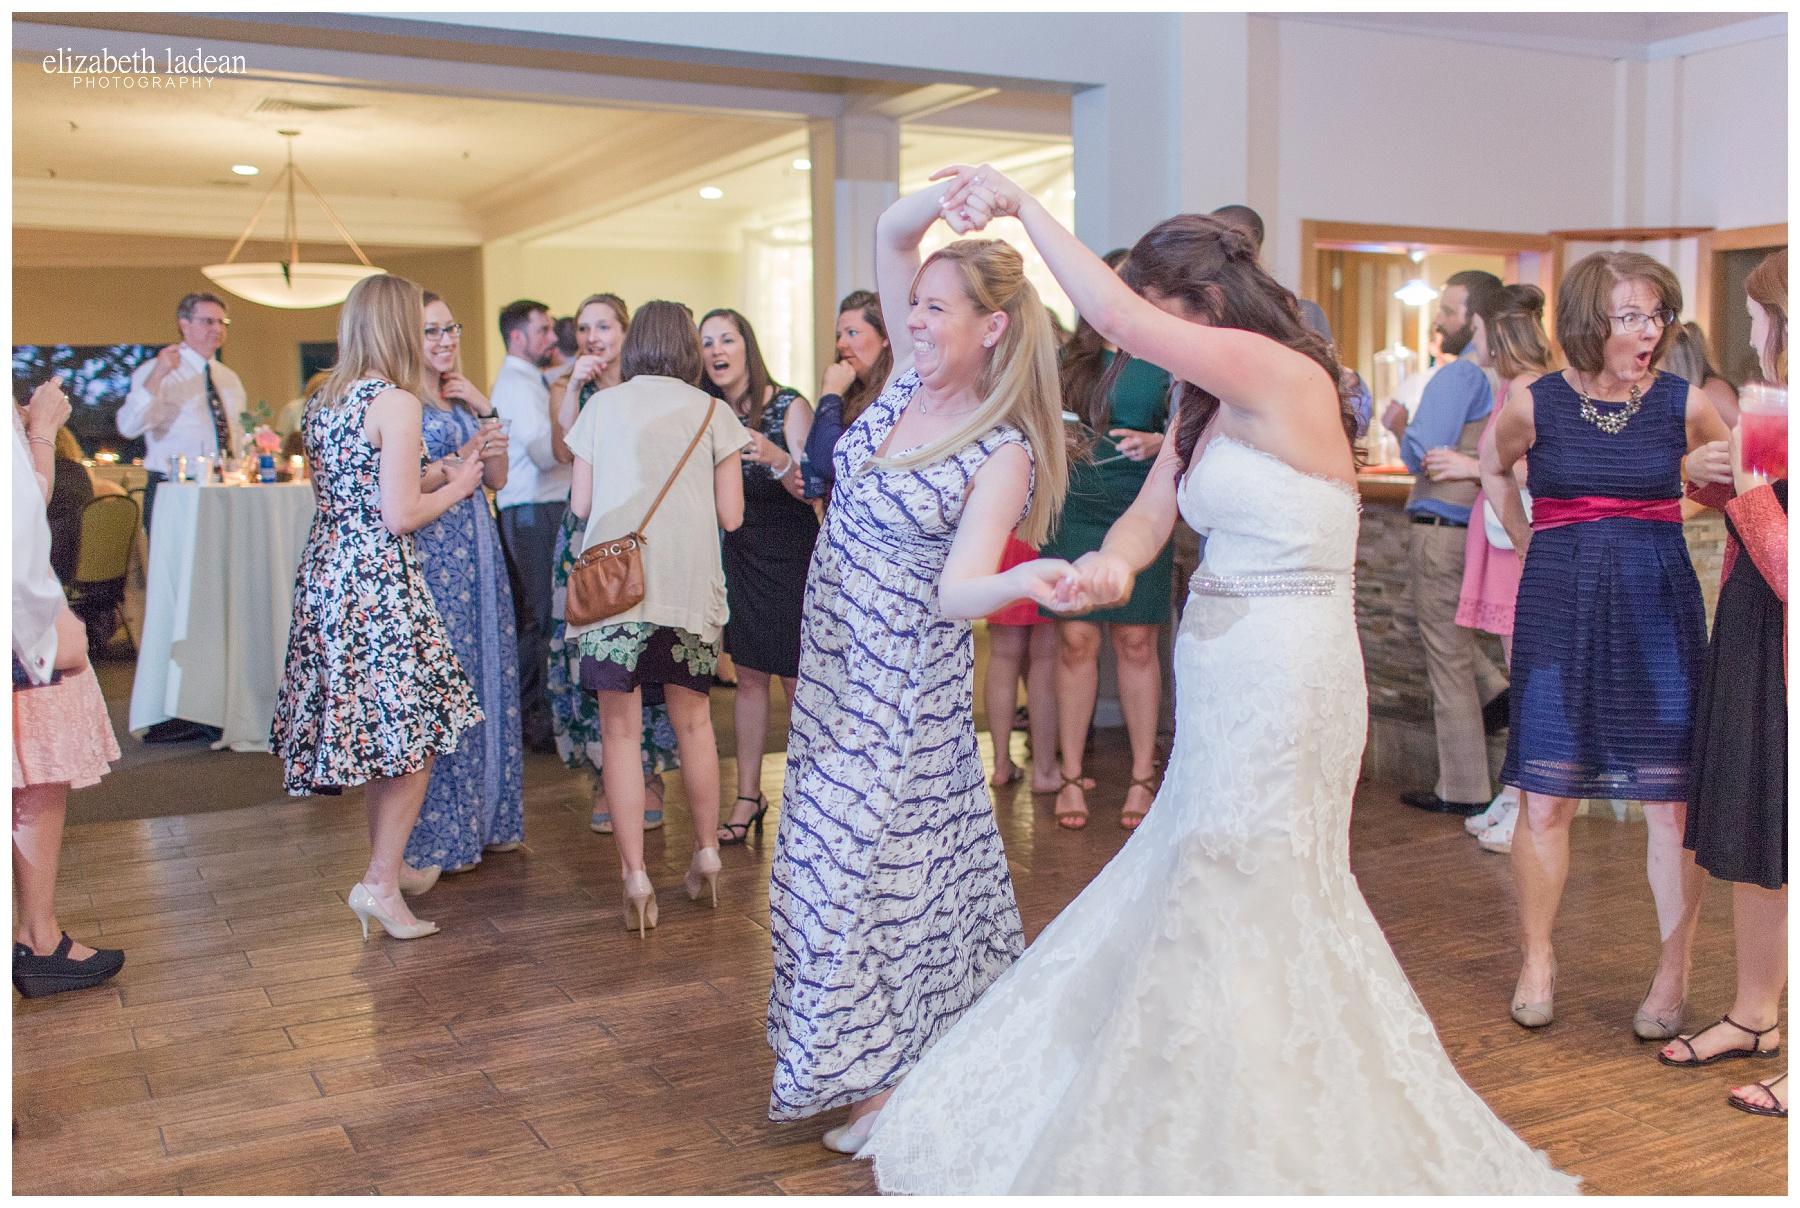 Hillcrest-Country-Club-Kansas-City-Wedding-Photography-E+J-0520-Elizabeth-Ladean-Photography-photo_0892.jpg